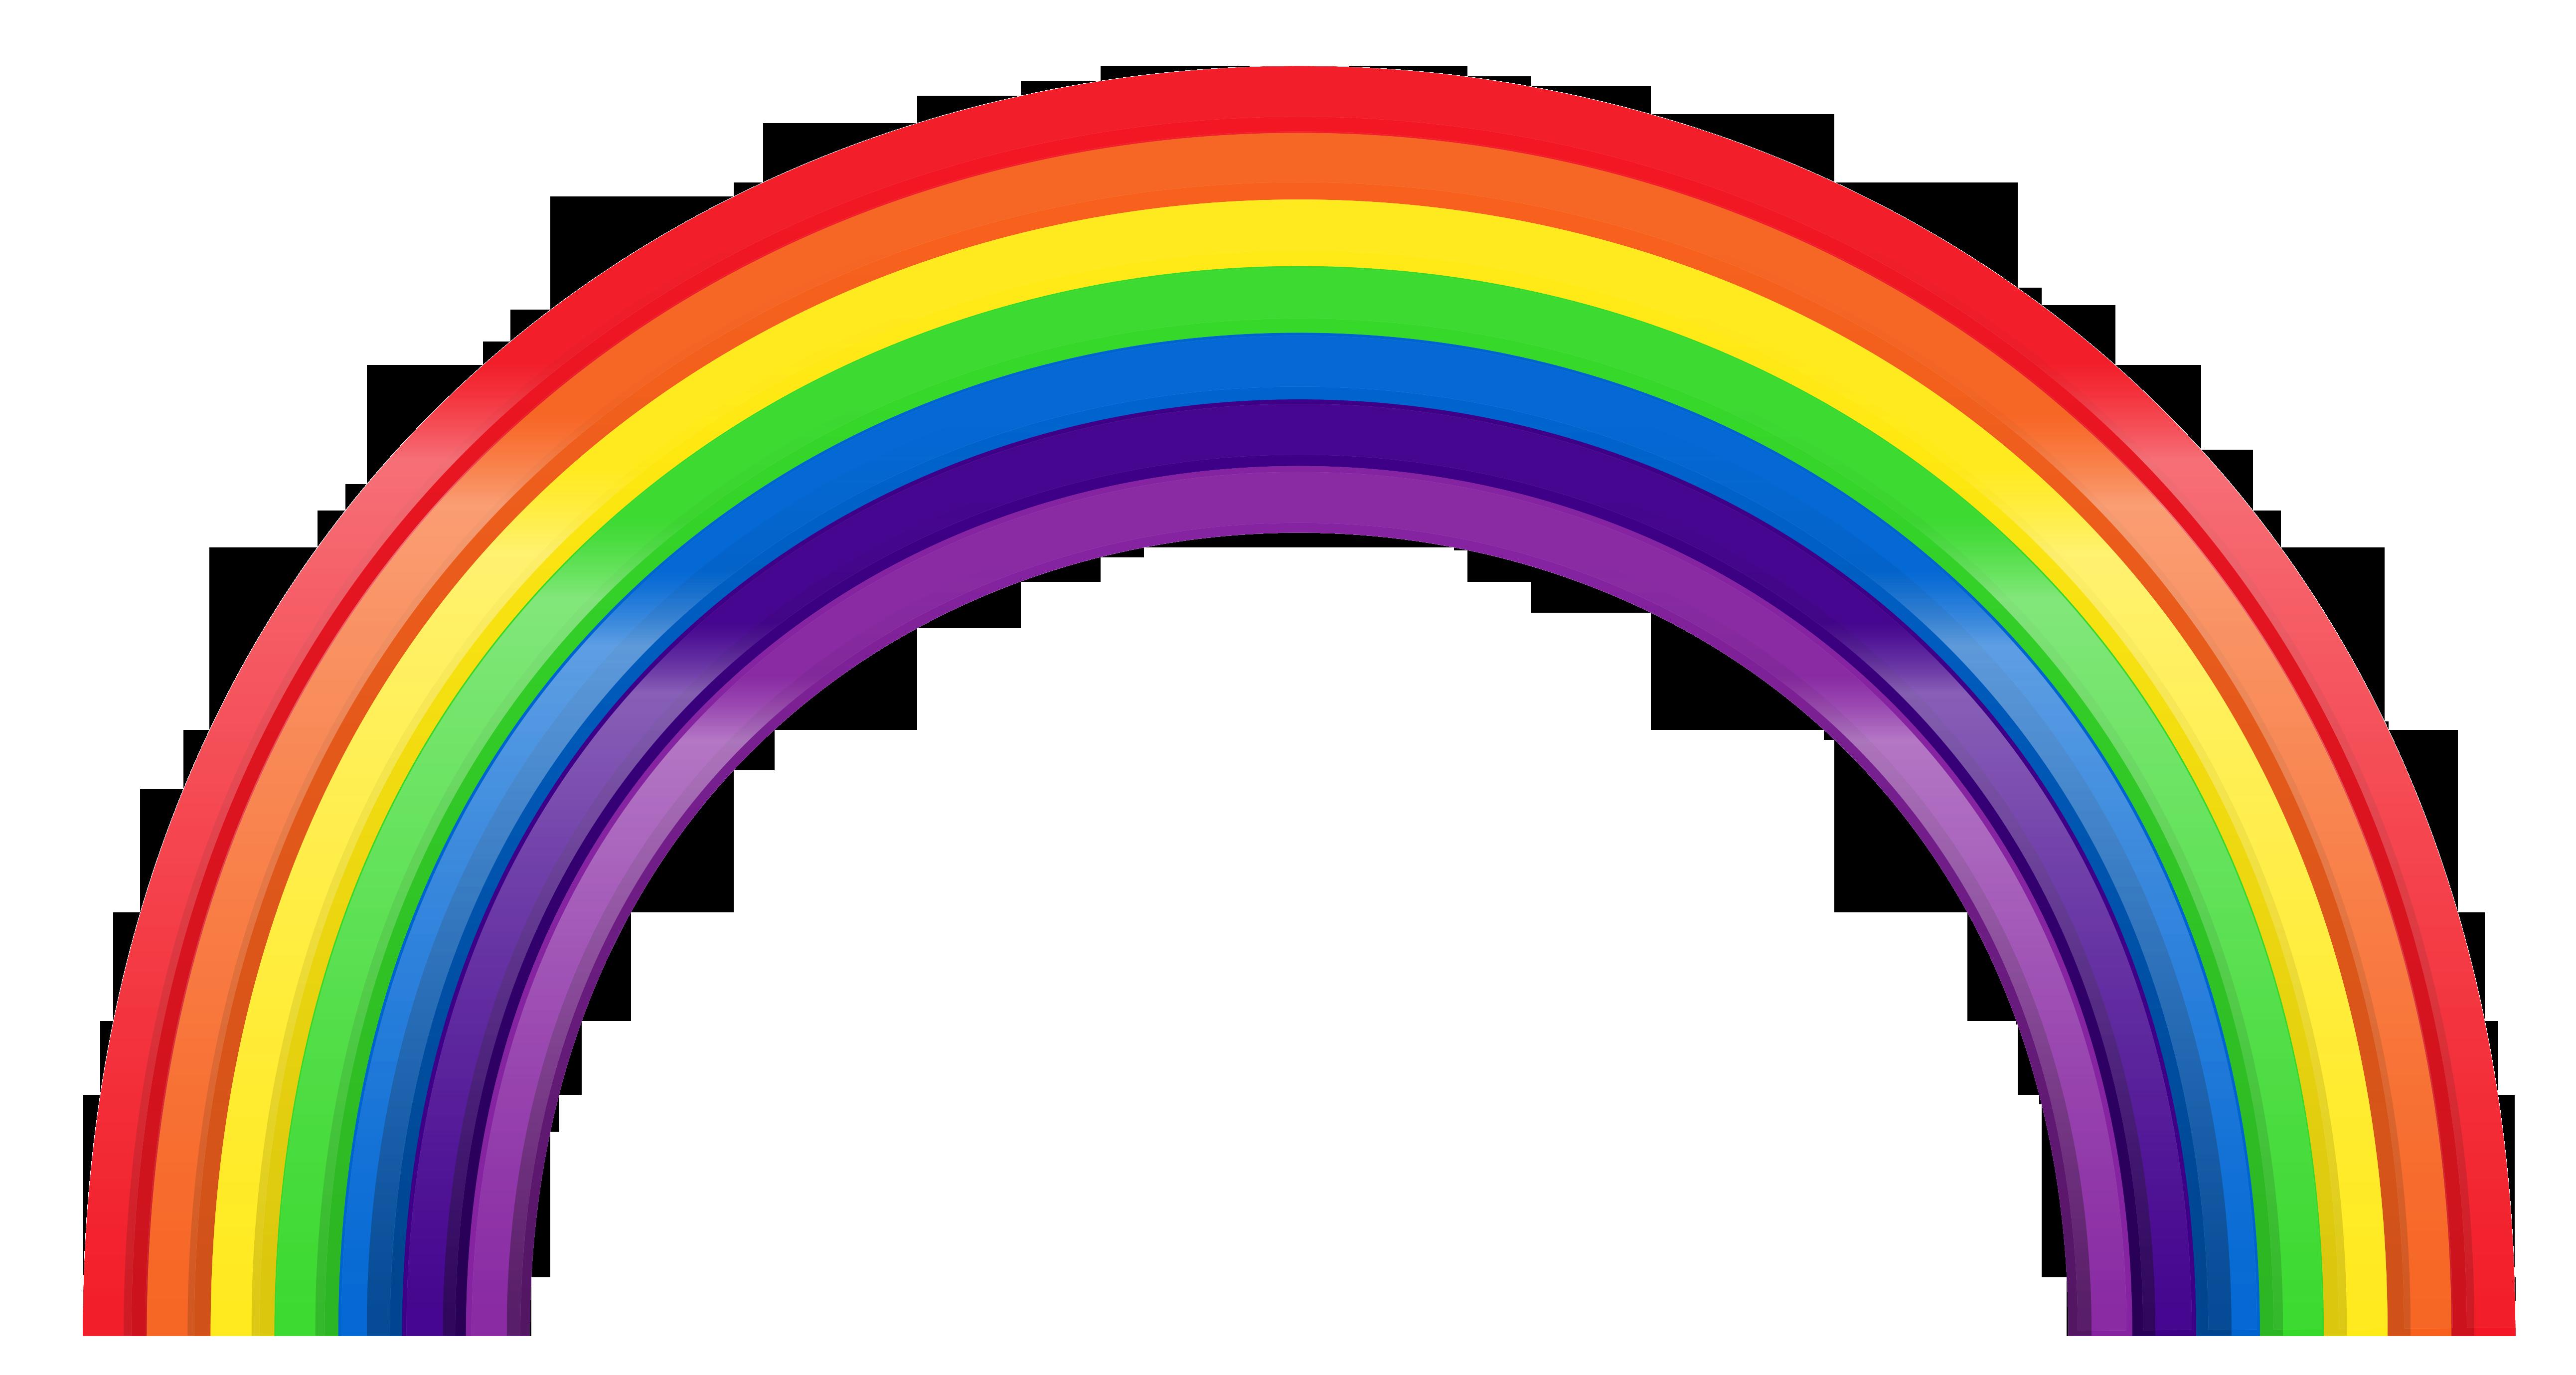 Rainbow Png - ClipArt Best